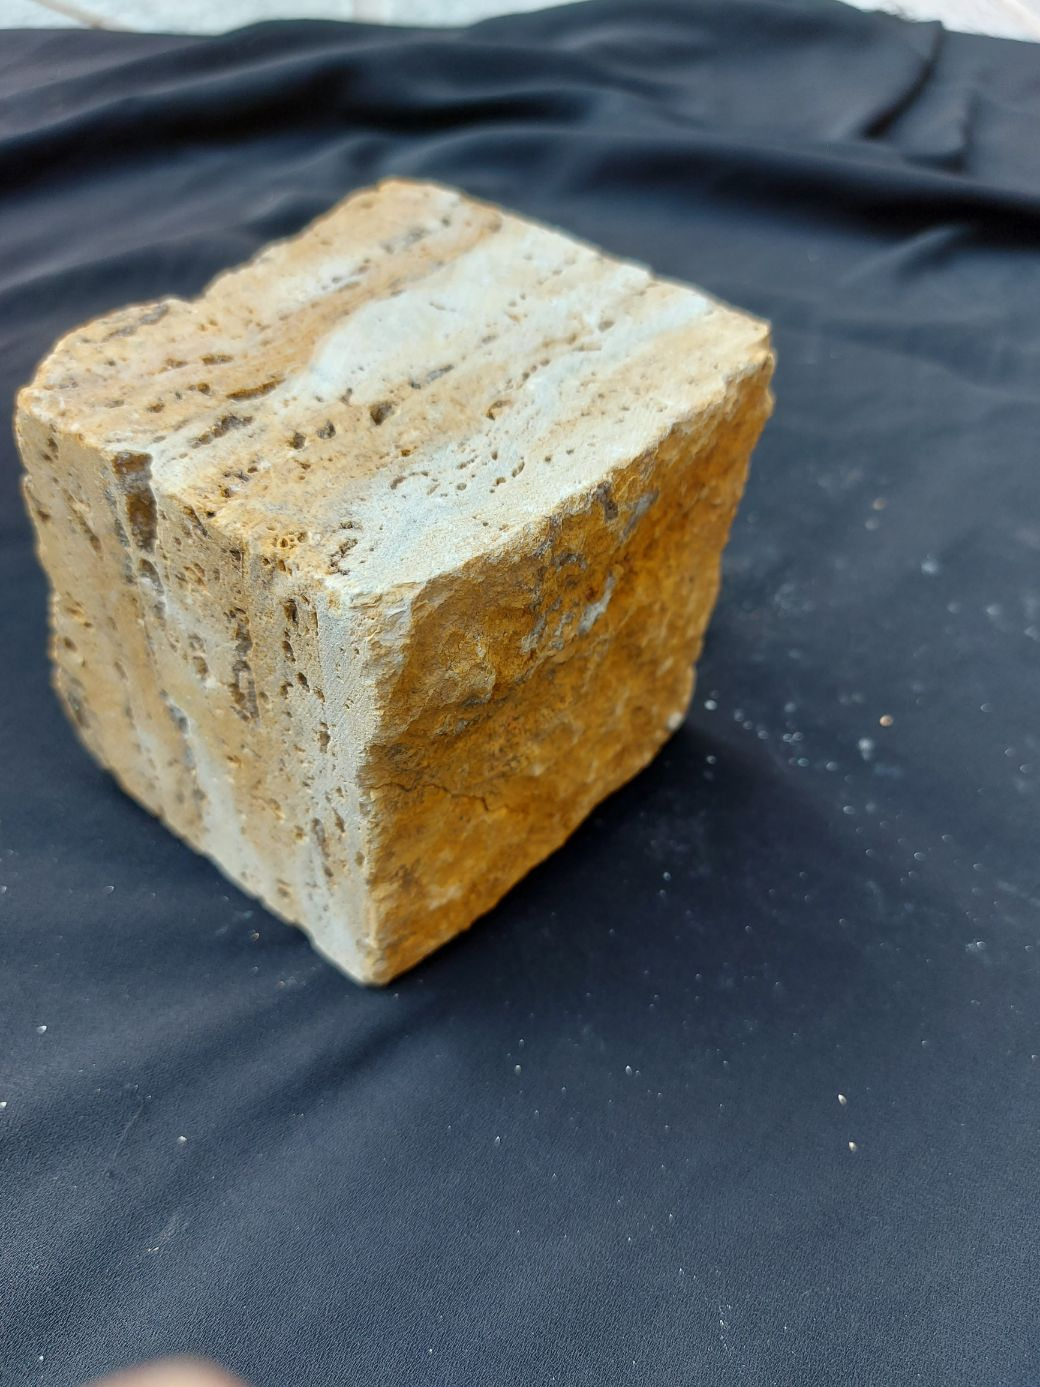 Cubic Isp stone